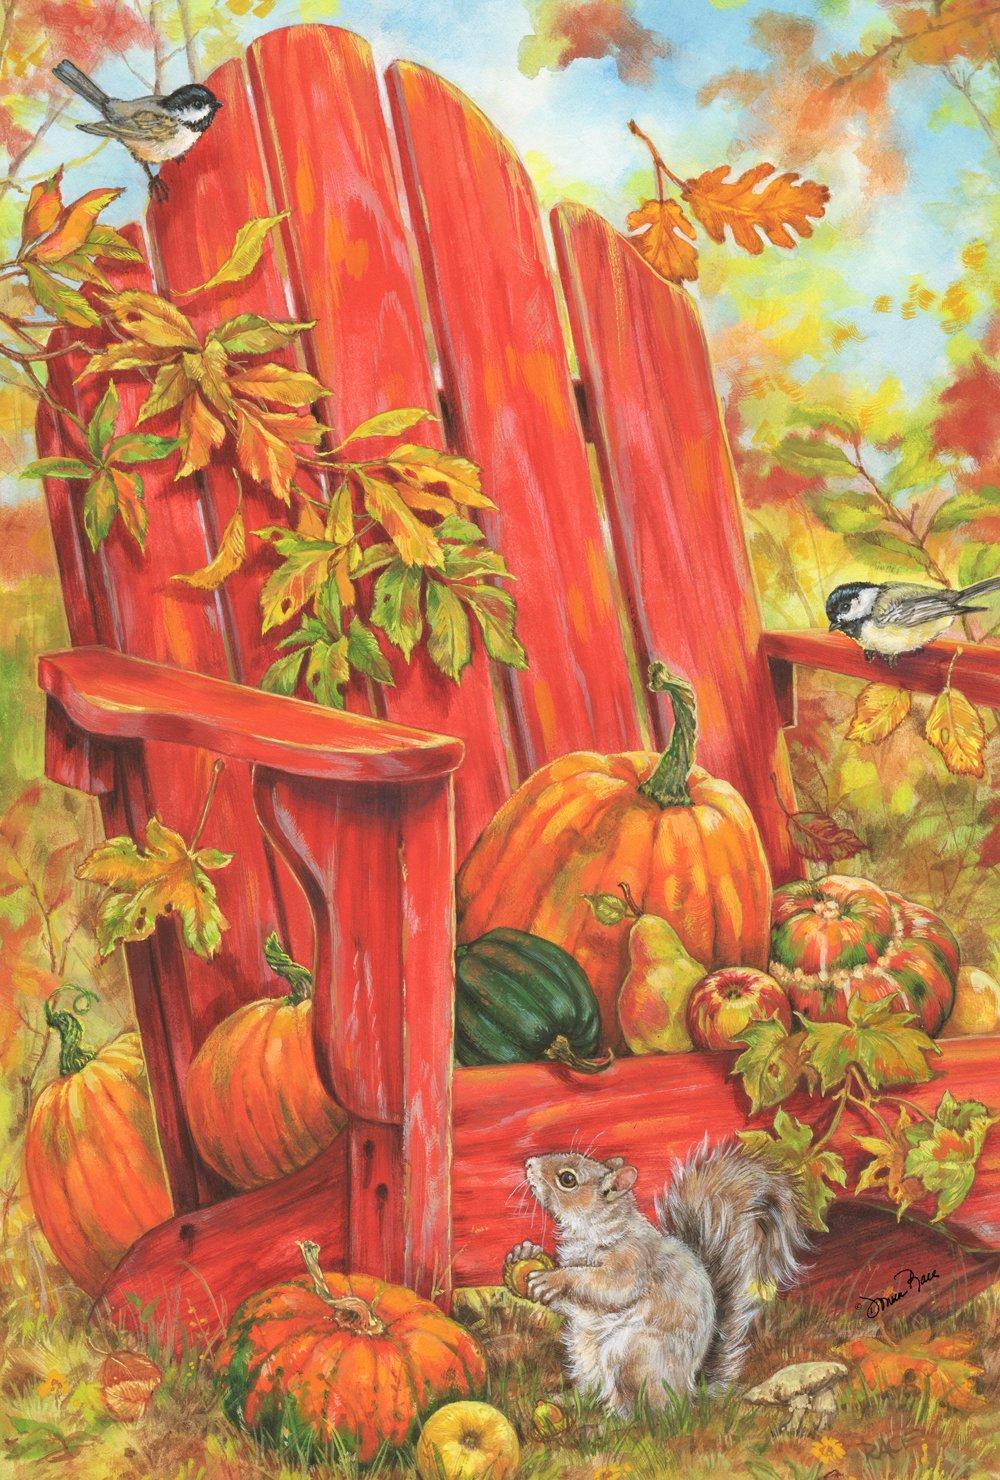 Toland Home Garden Fall Adirondack 28 x 40 Inch Decorative Autumn Harvest Chair Pumpkin Squirrel House Flag